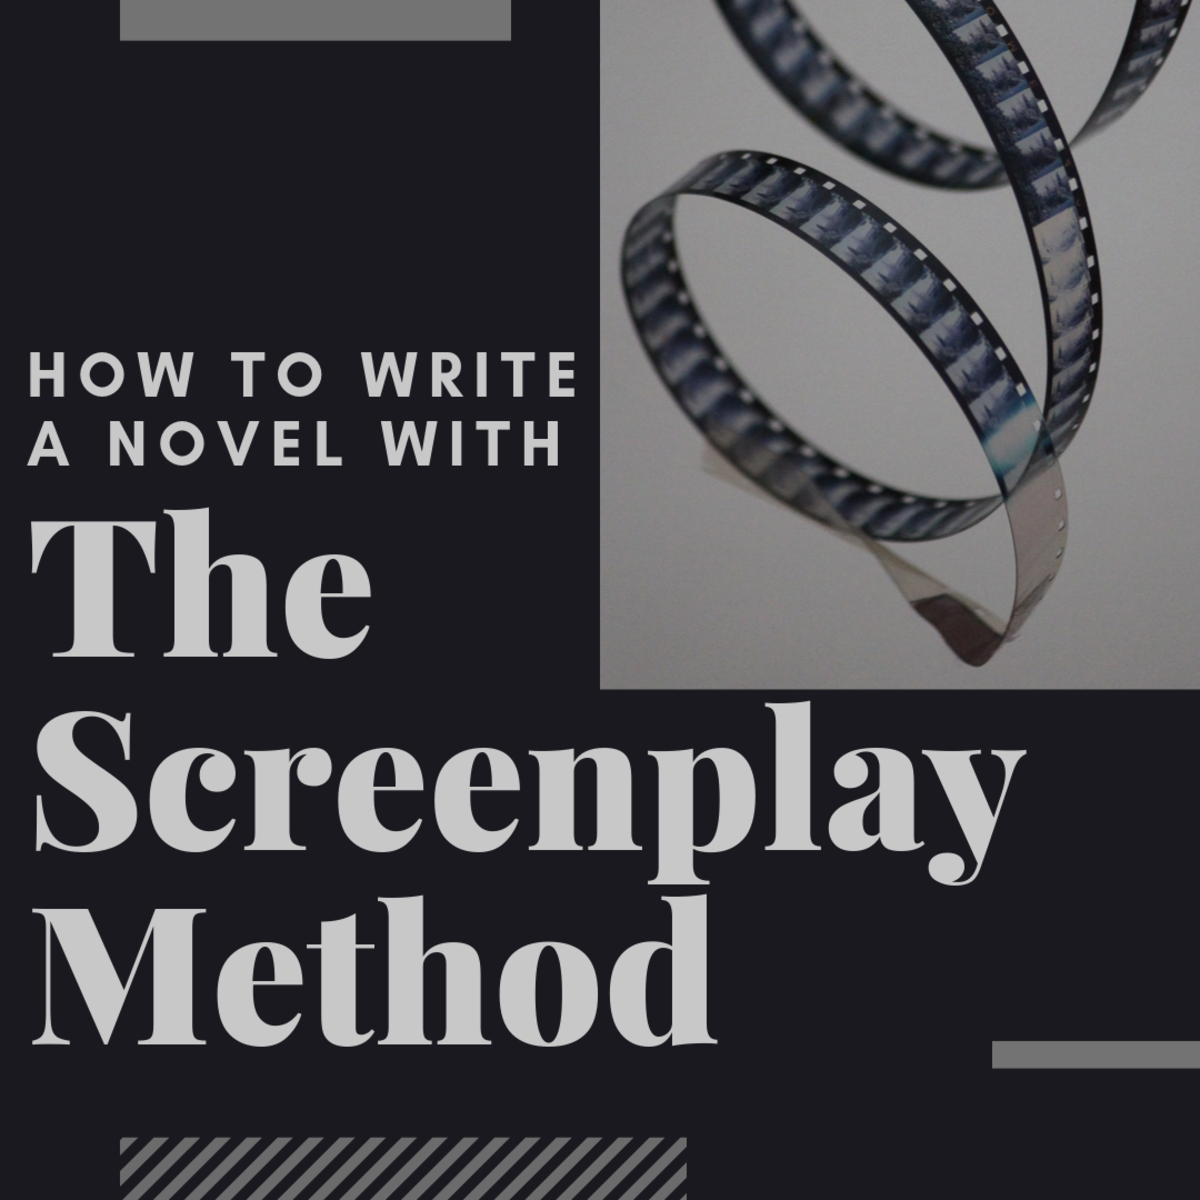 How to Write a Novel Using